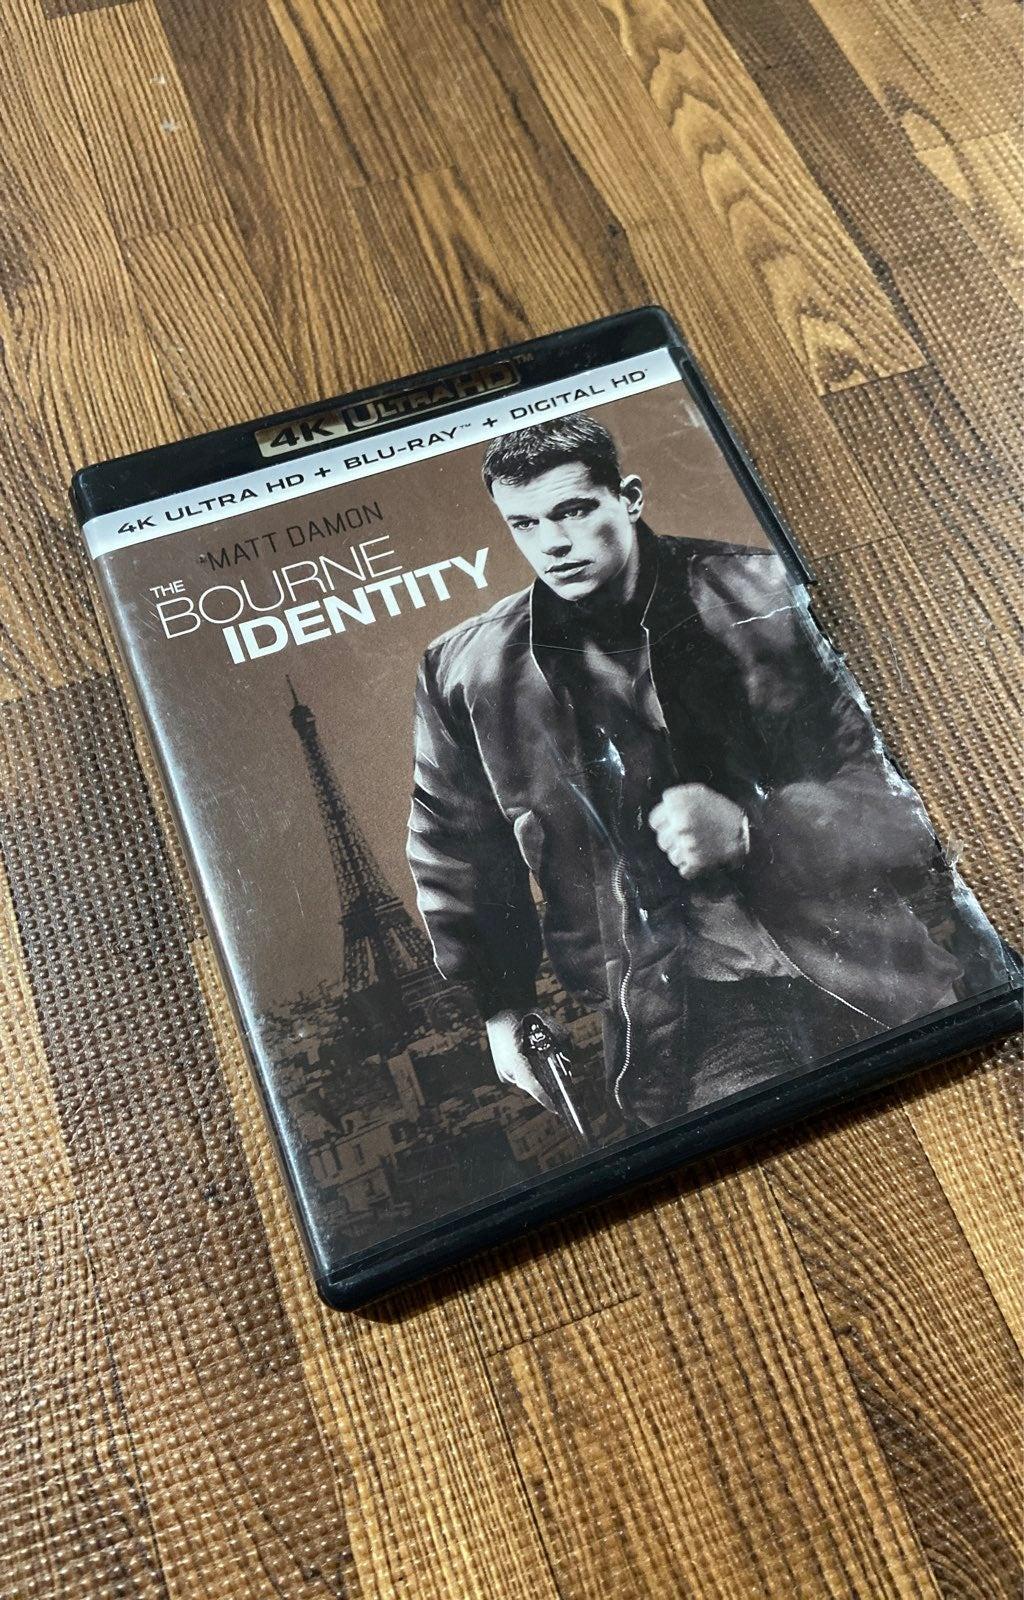 The Bourne Idendity 4K Ultra HD BluRay